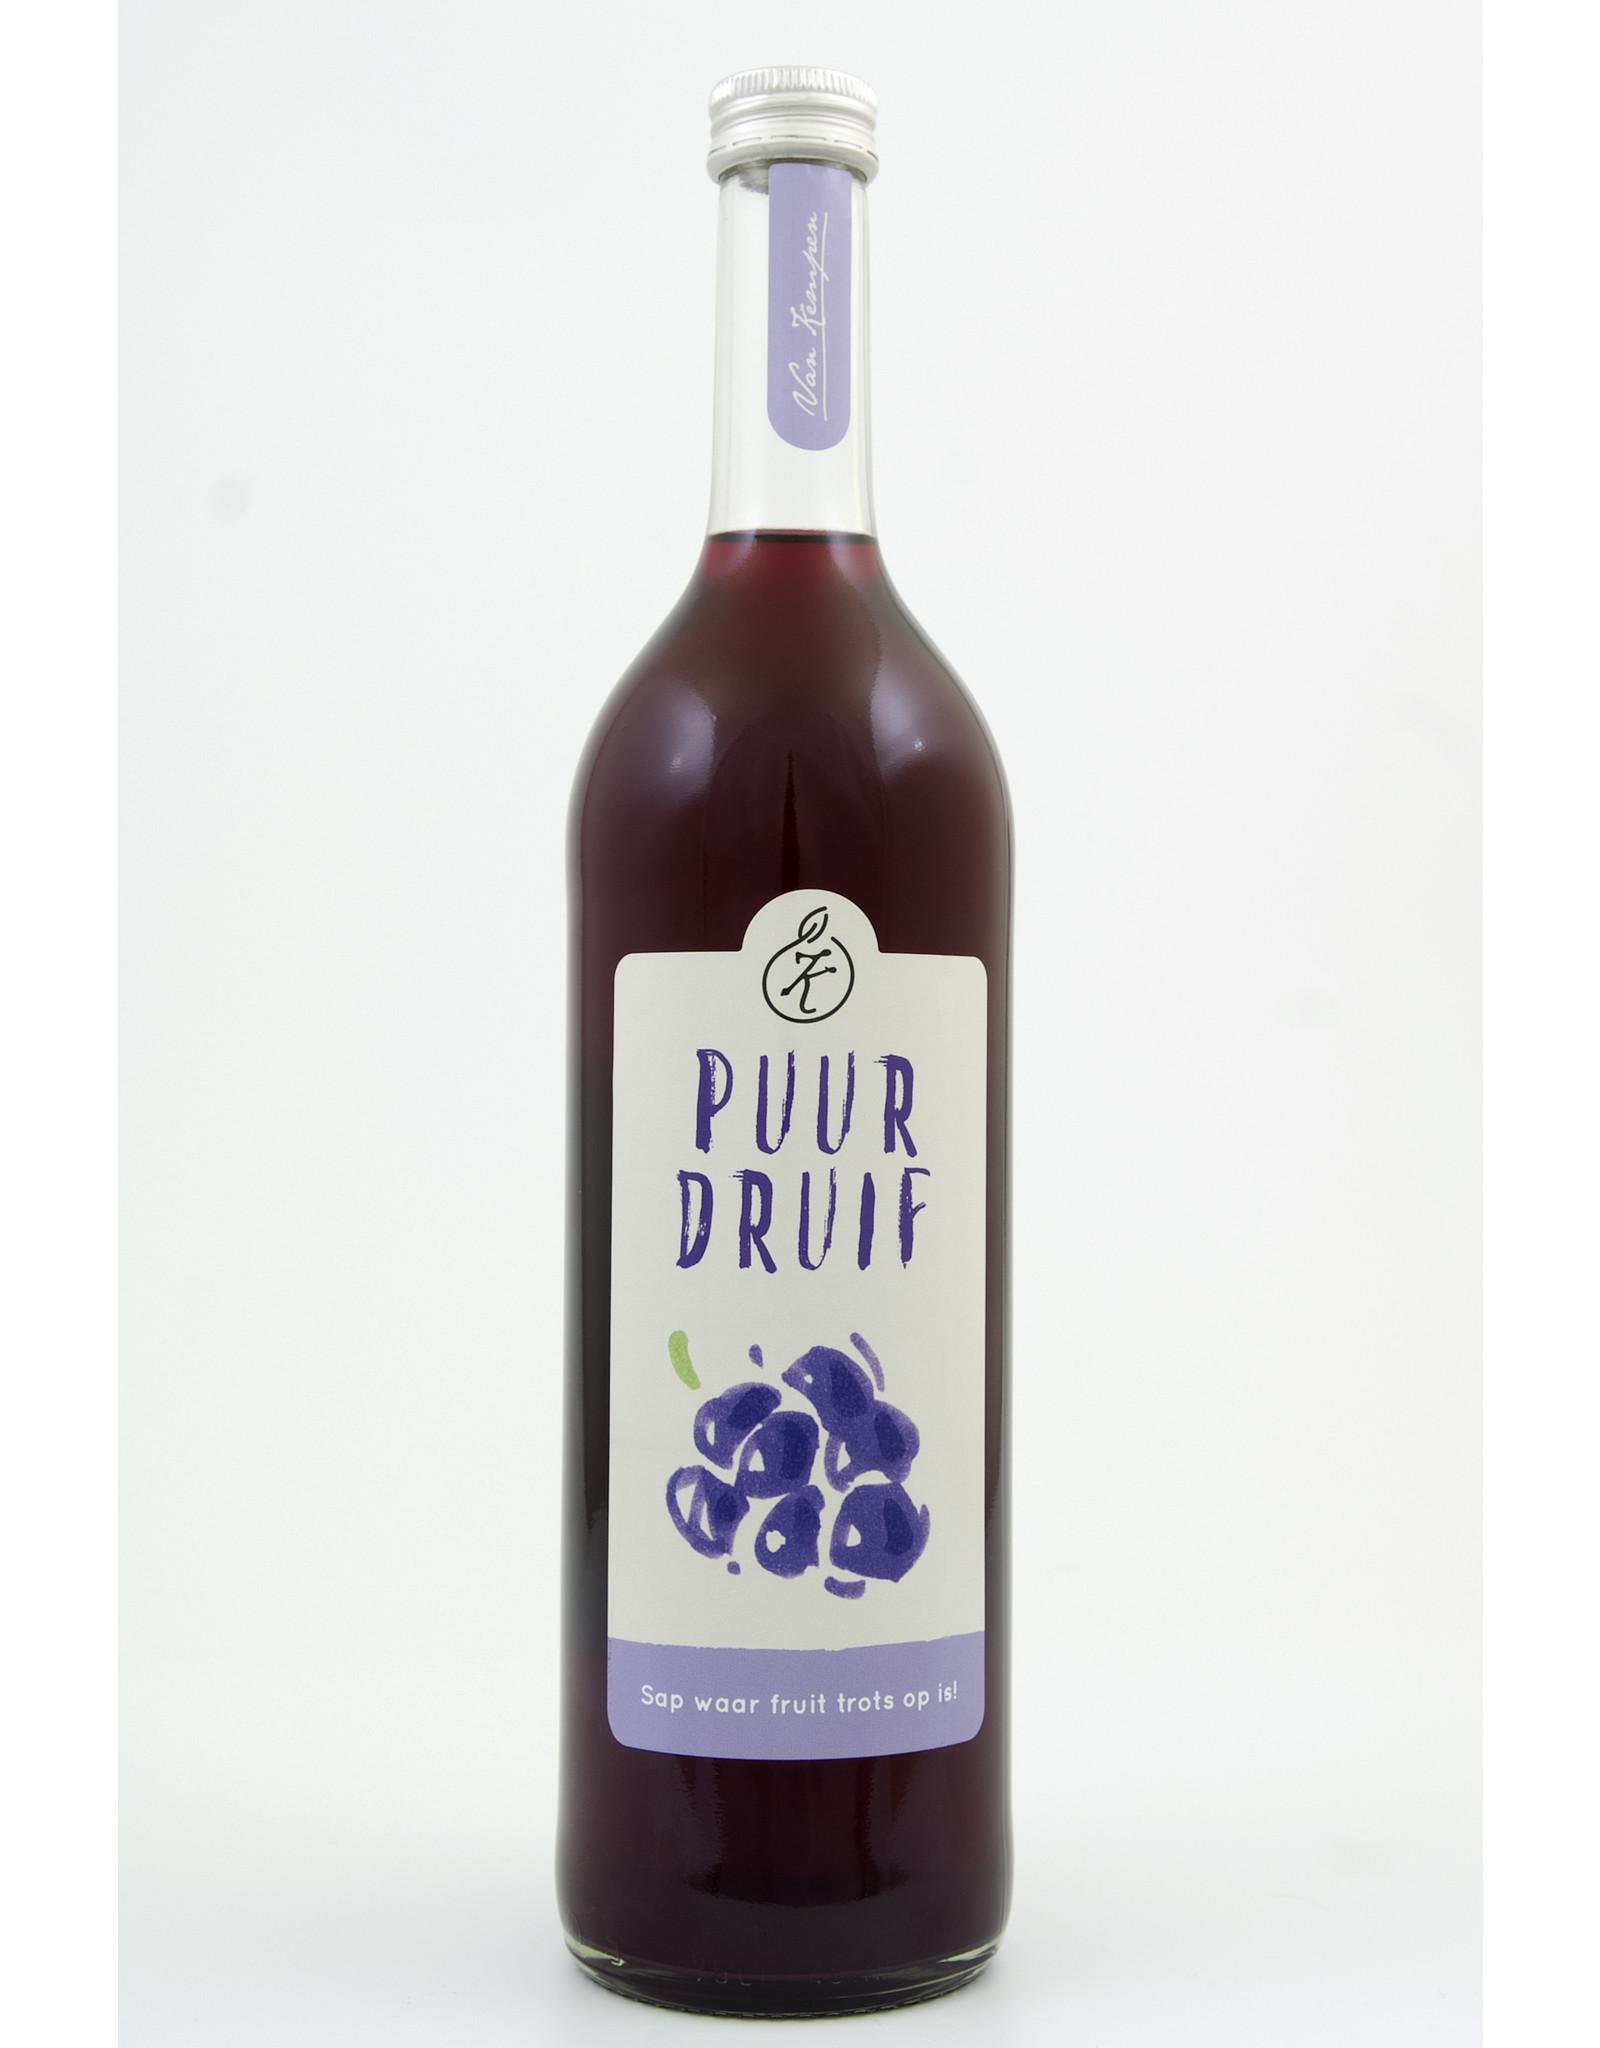 Van Kempen Puur druif sap 0,75 liter